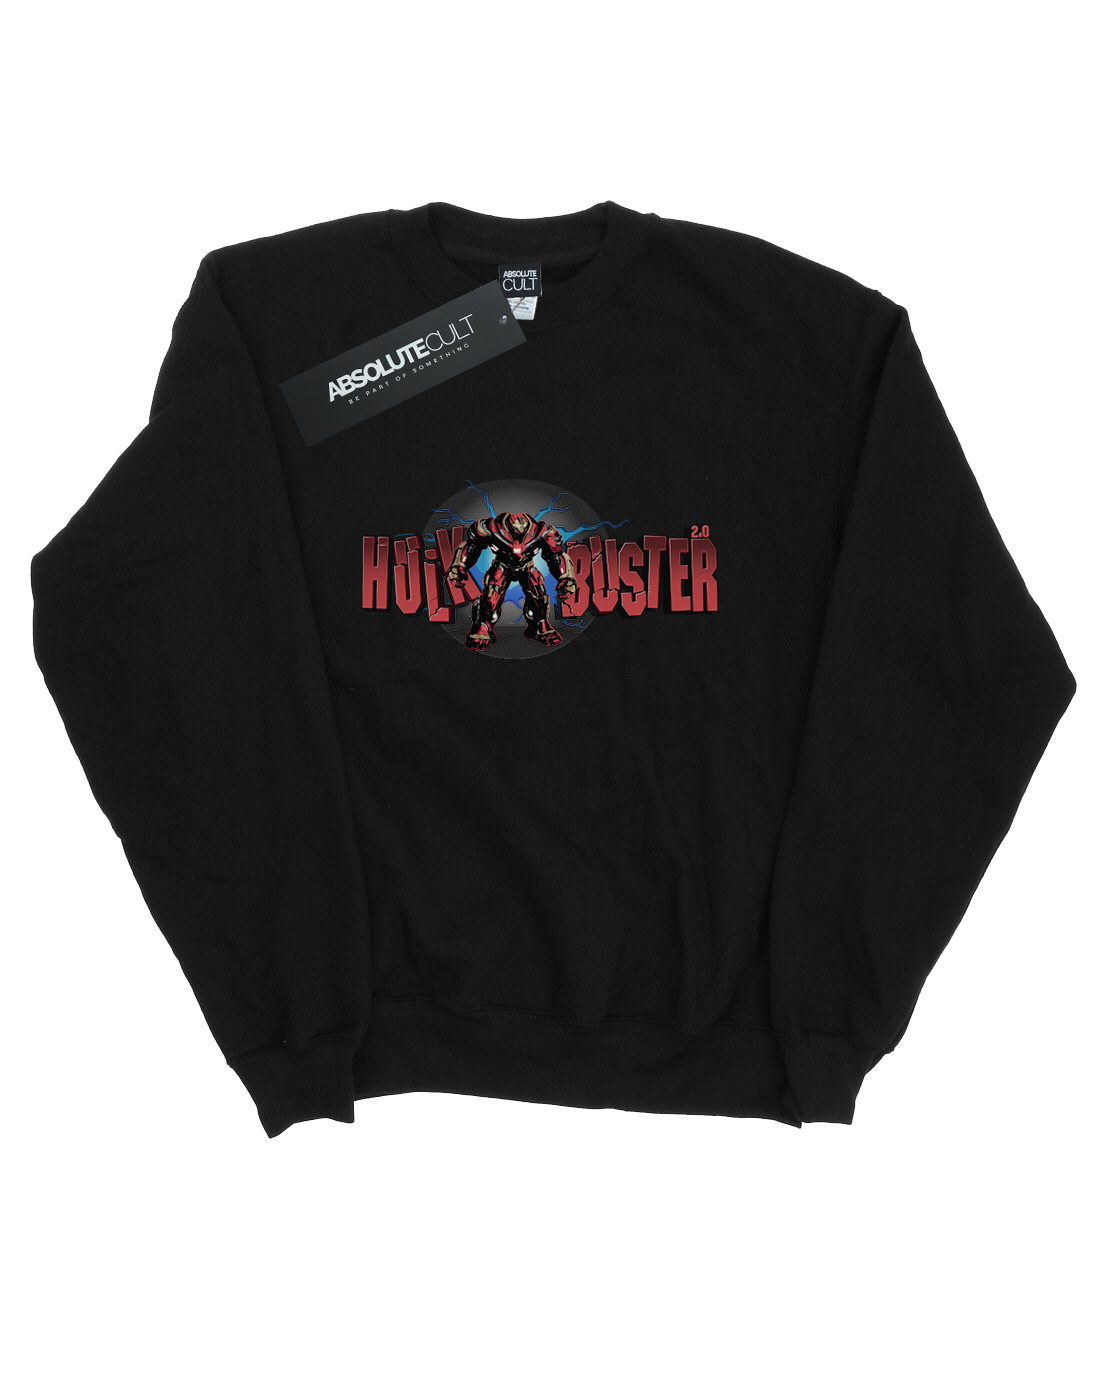 Hulkbuster War Uomo 2 Felpa 0 Avengers Infinity w1qAax0HxT